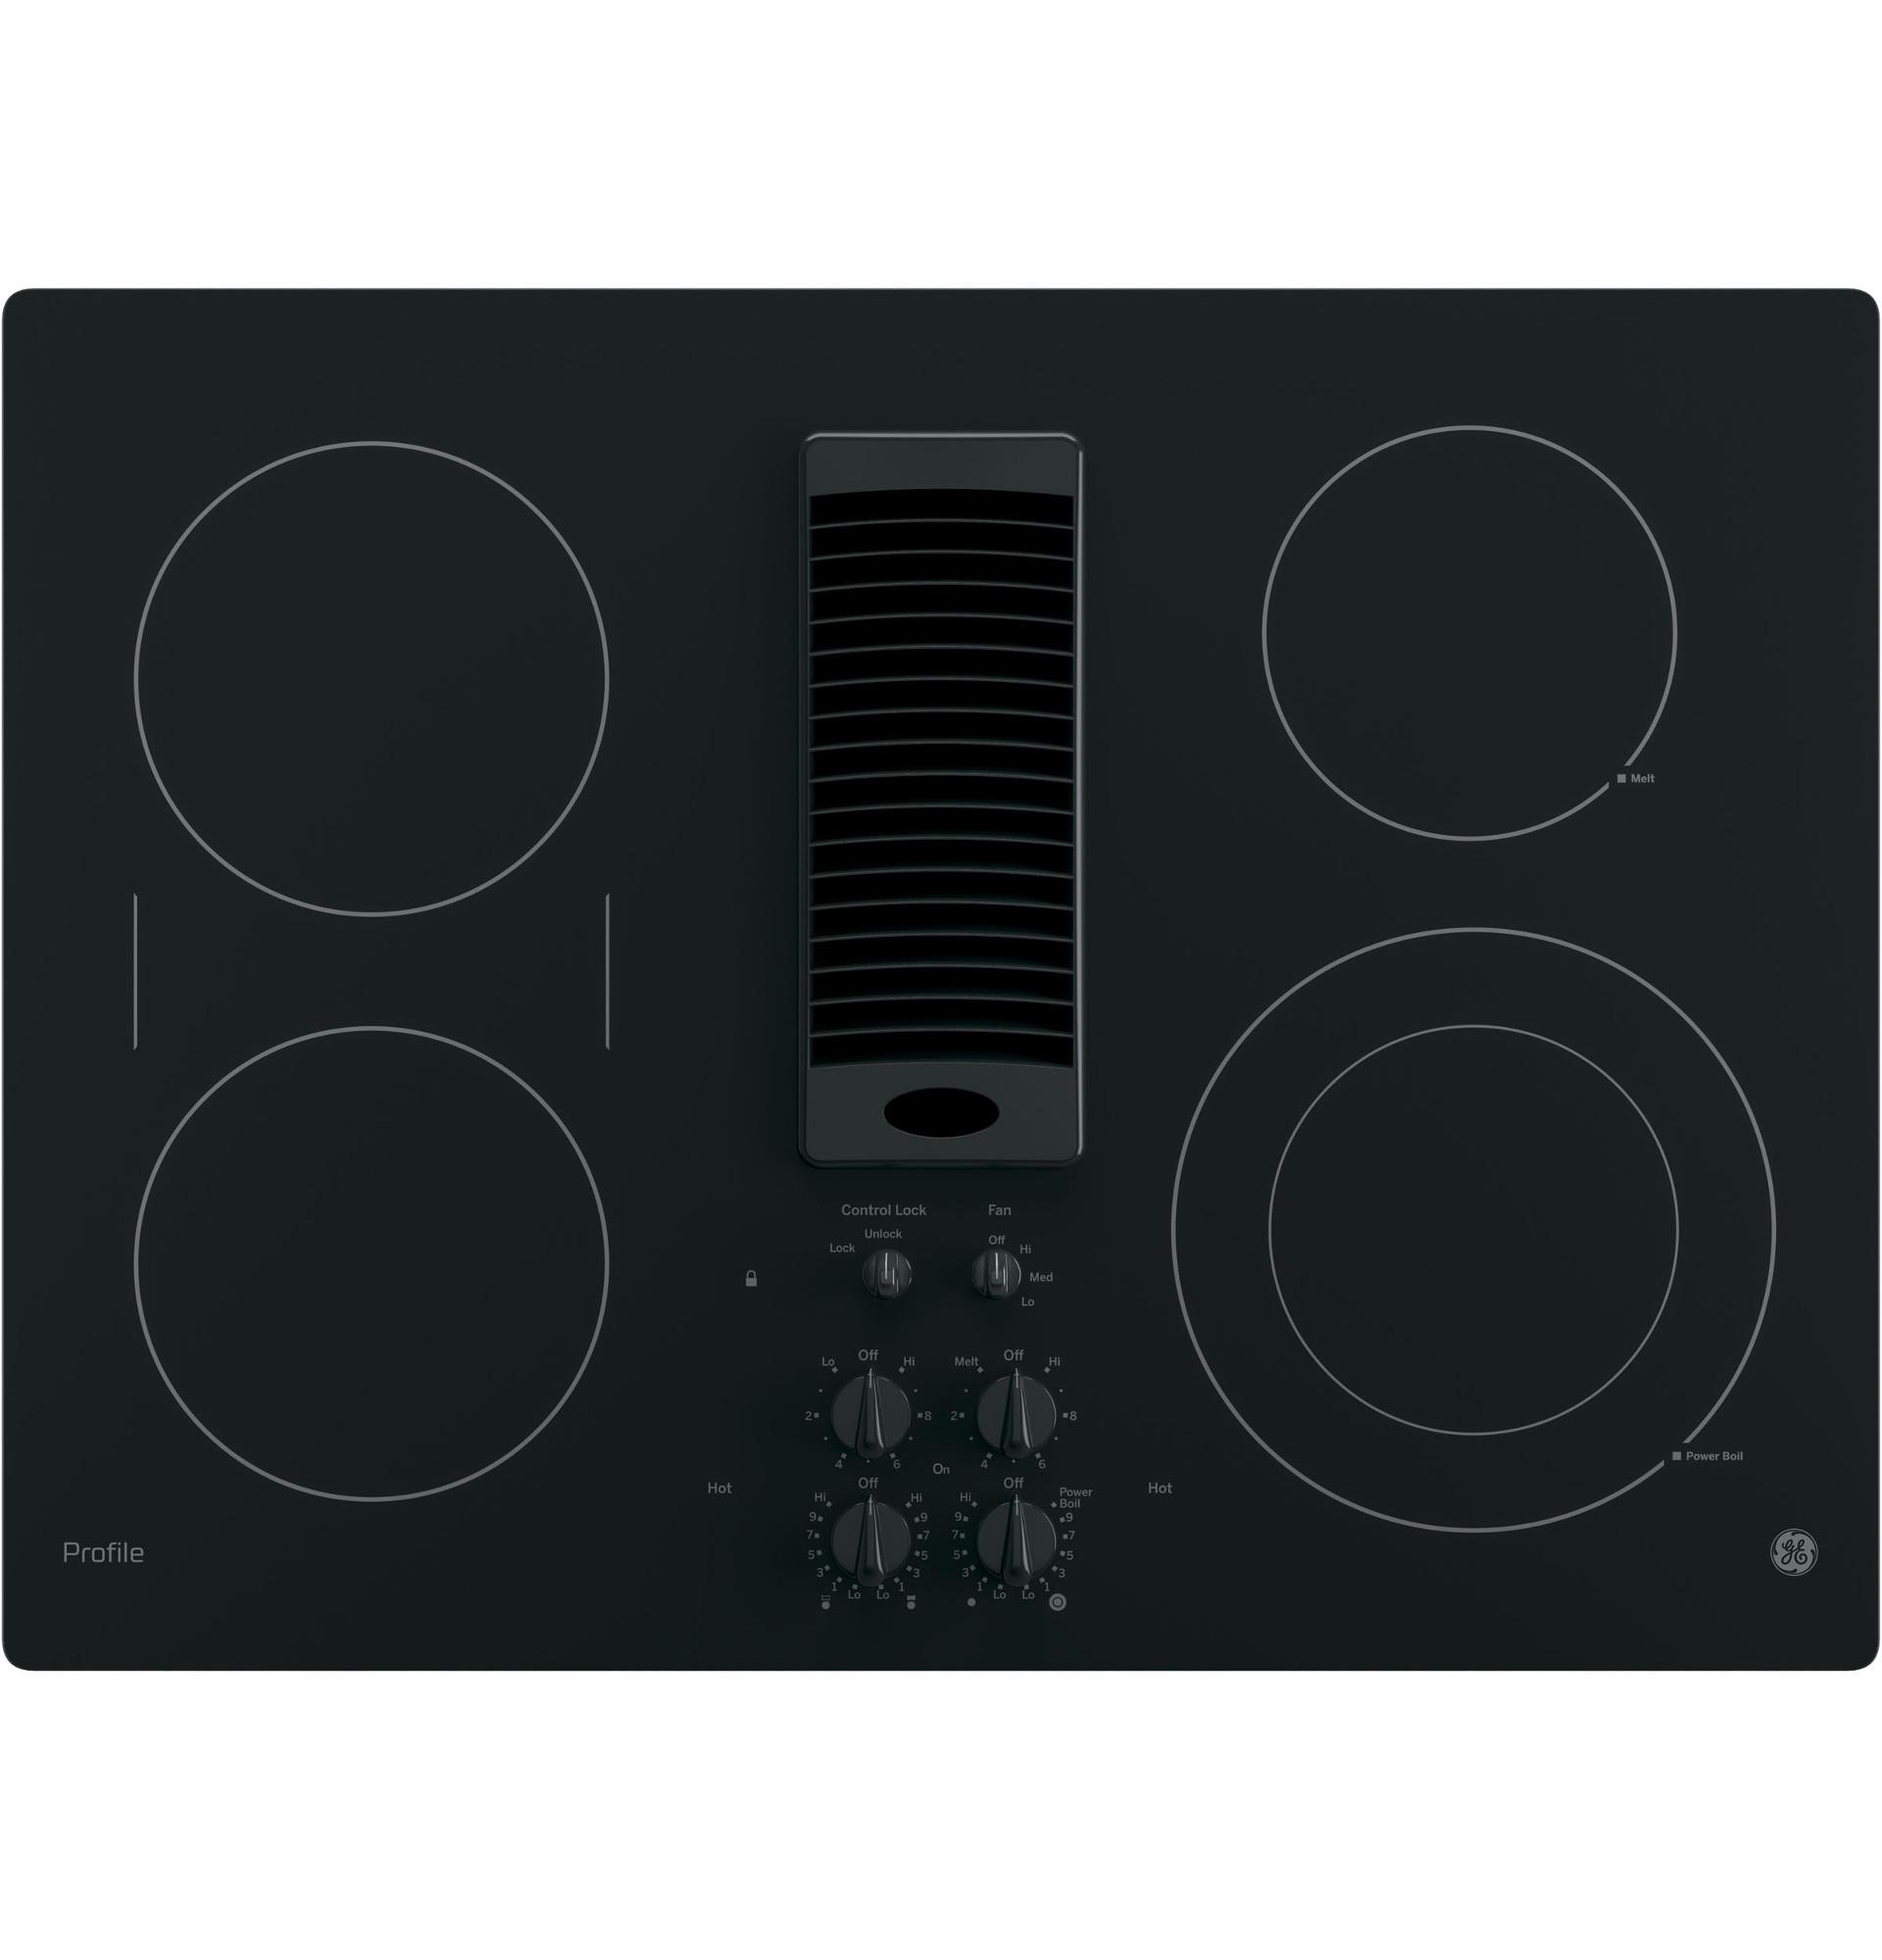 electric stove metric conversion diagram shop the best cooktops gas tops at sears ge profile series pp9830djbb 30 downdraft cooktop black